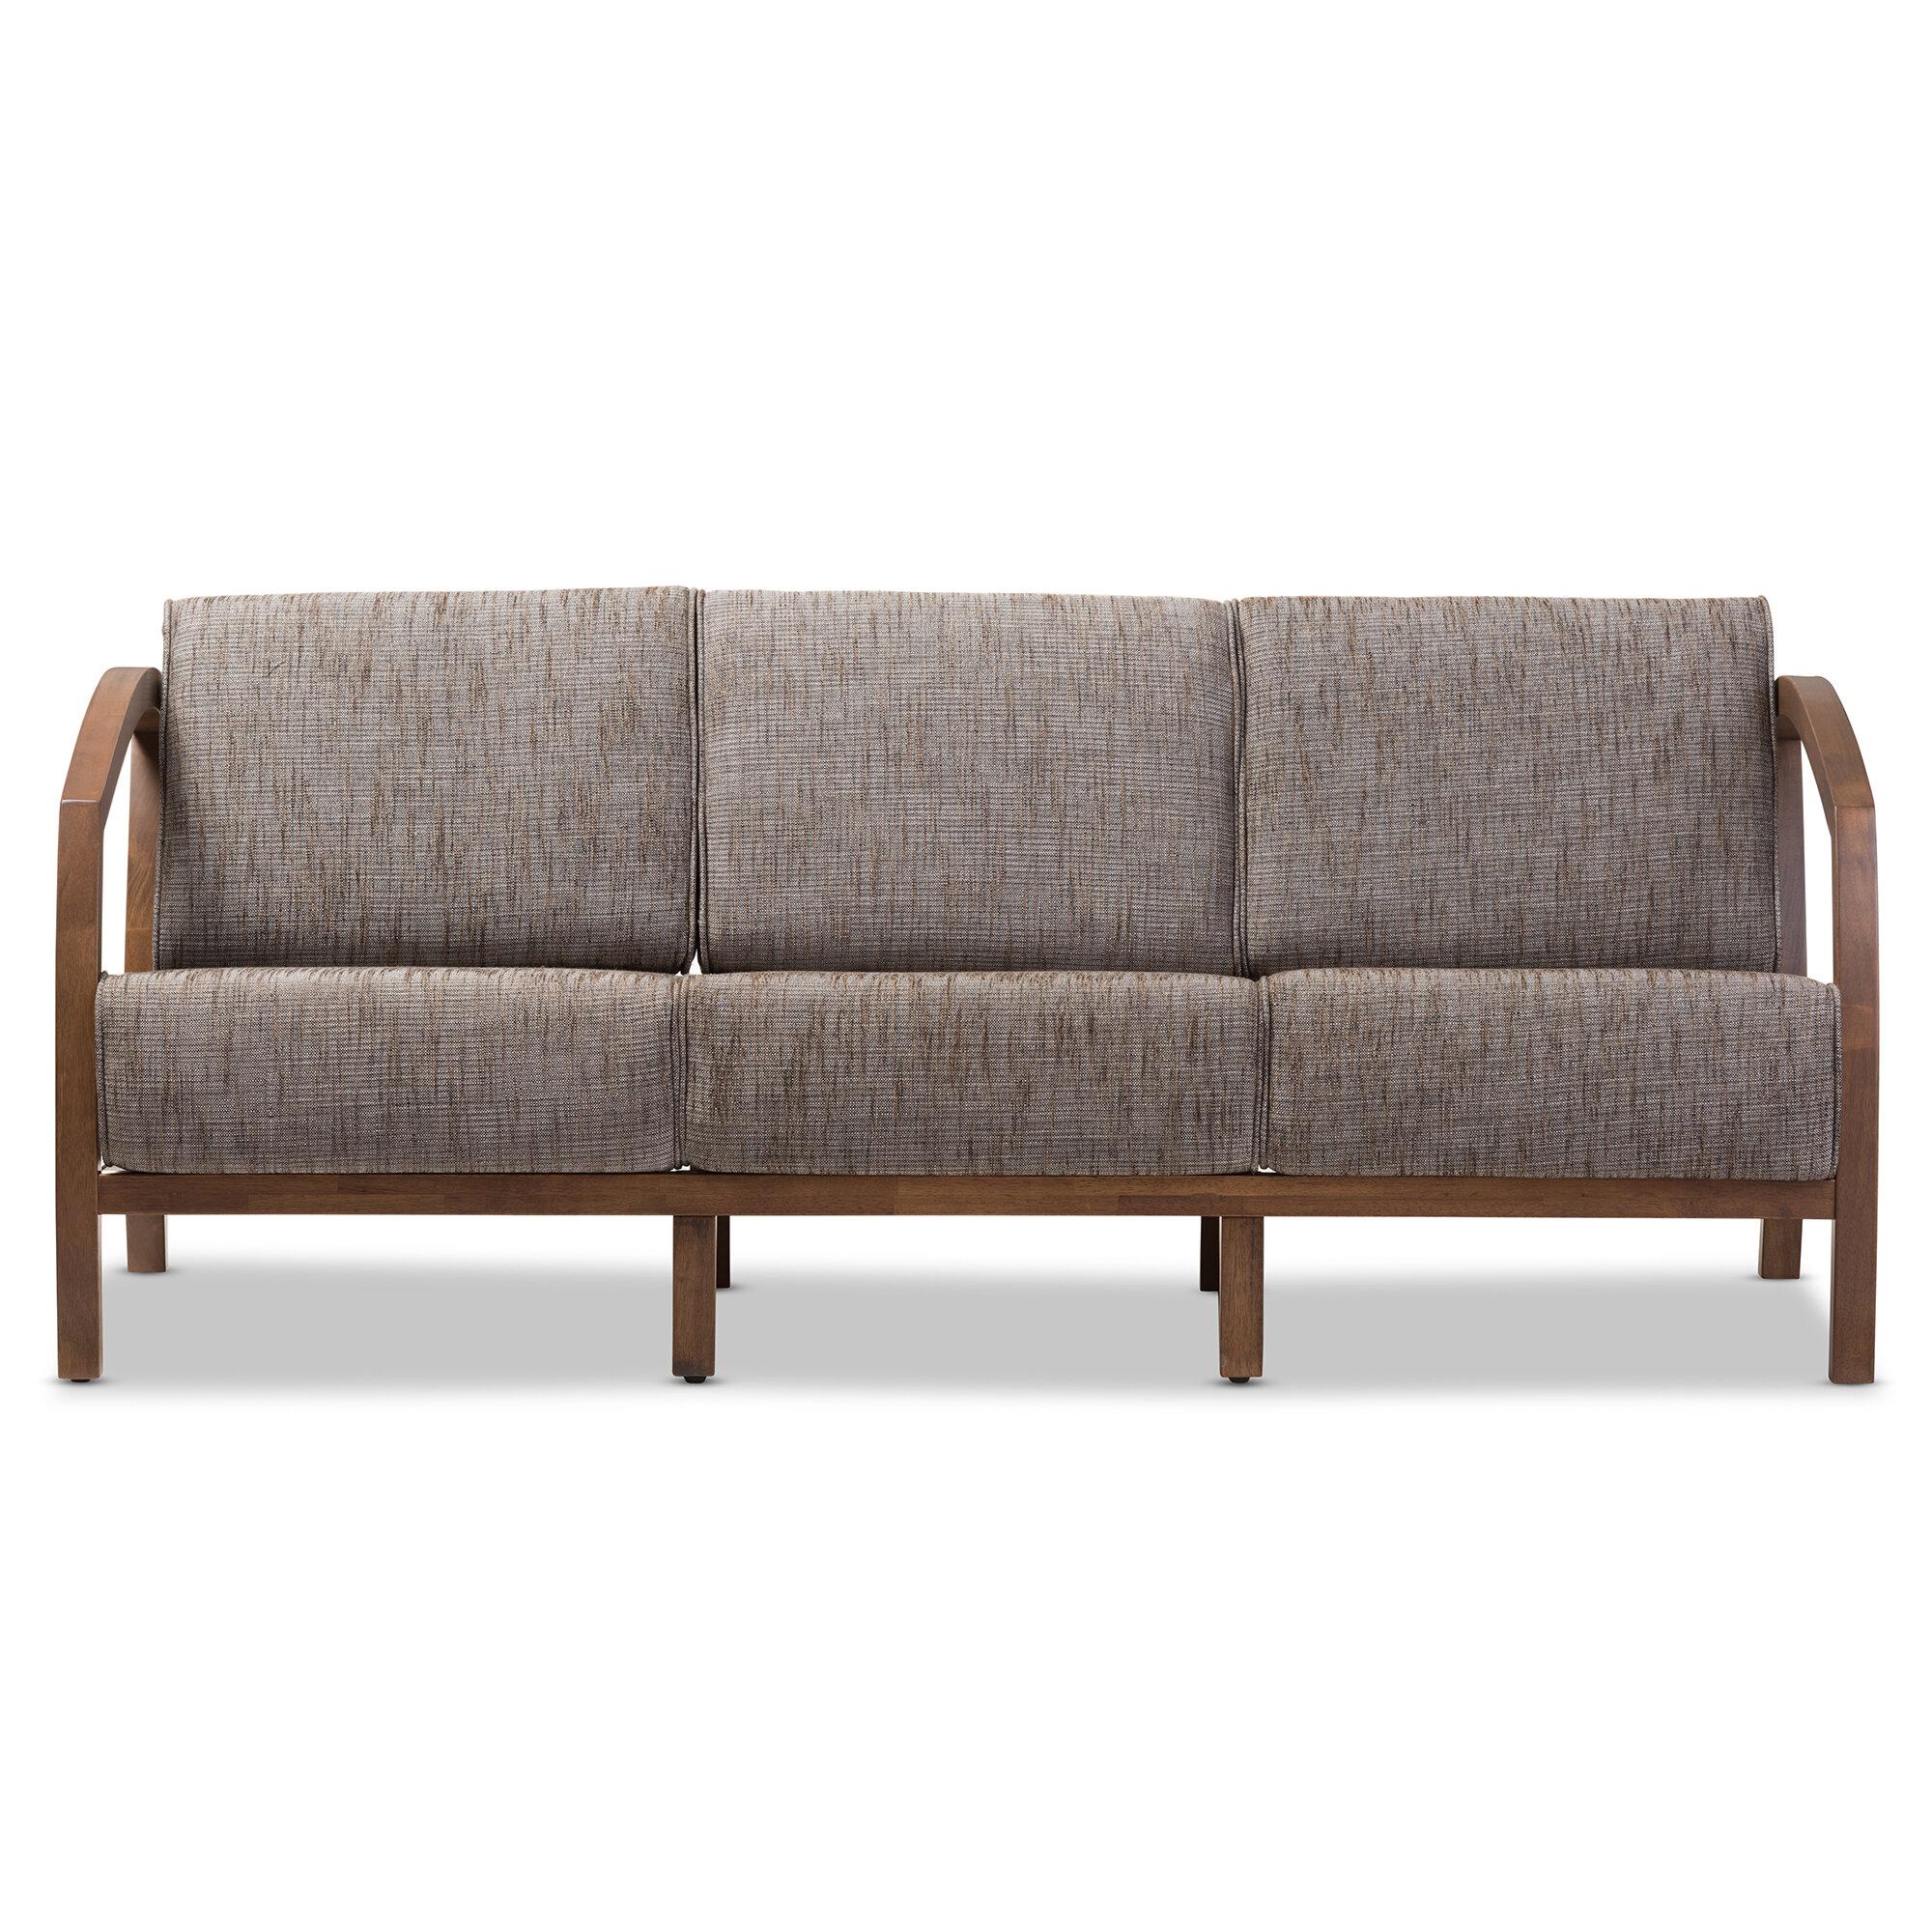 Whole Interiors Baxton Studio Arrigo 3 Seater Sofa Reviews Wayfair